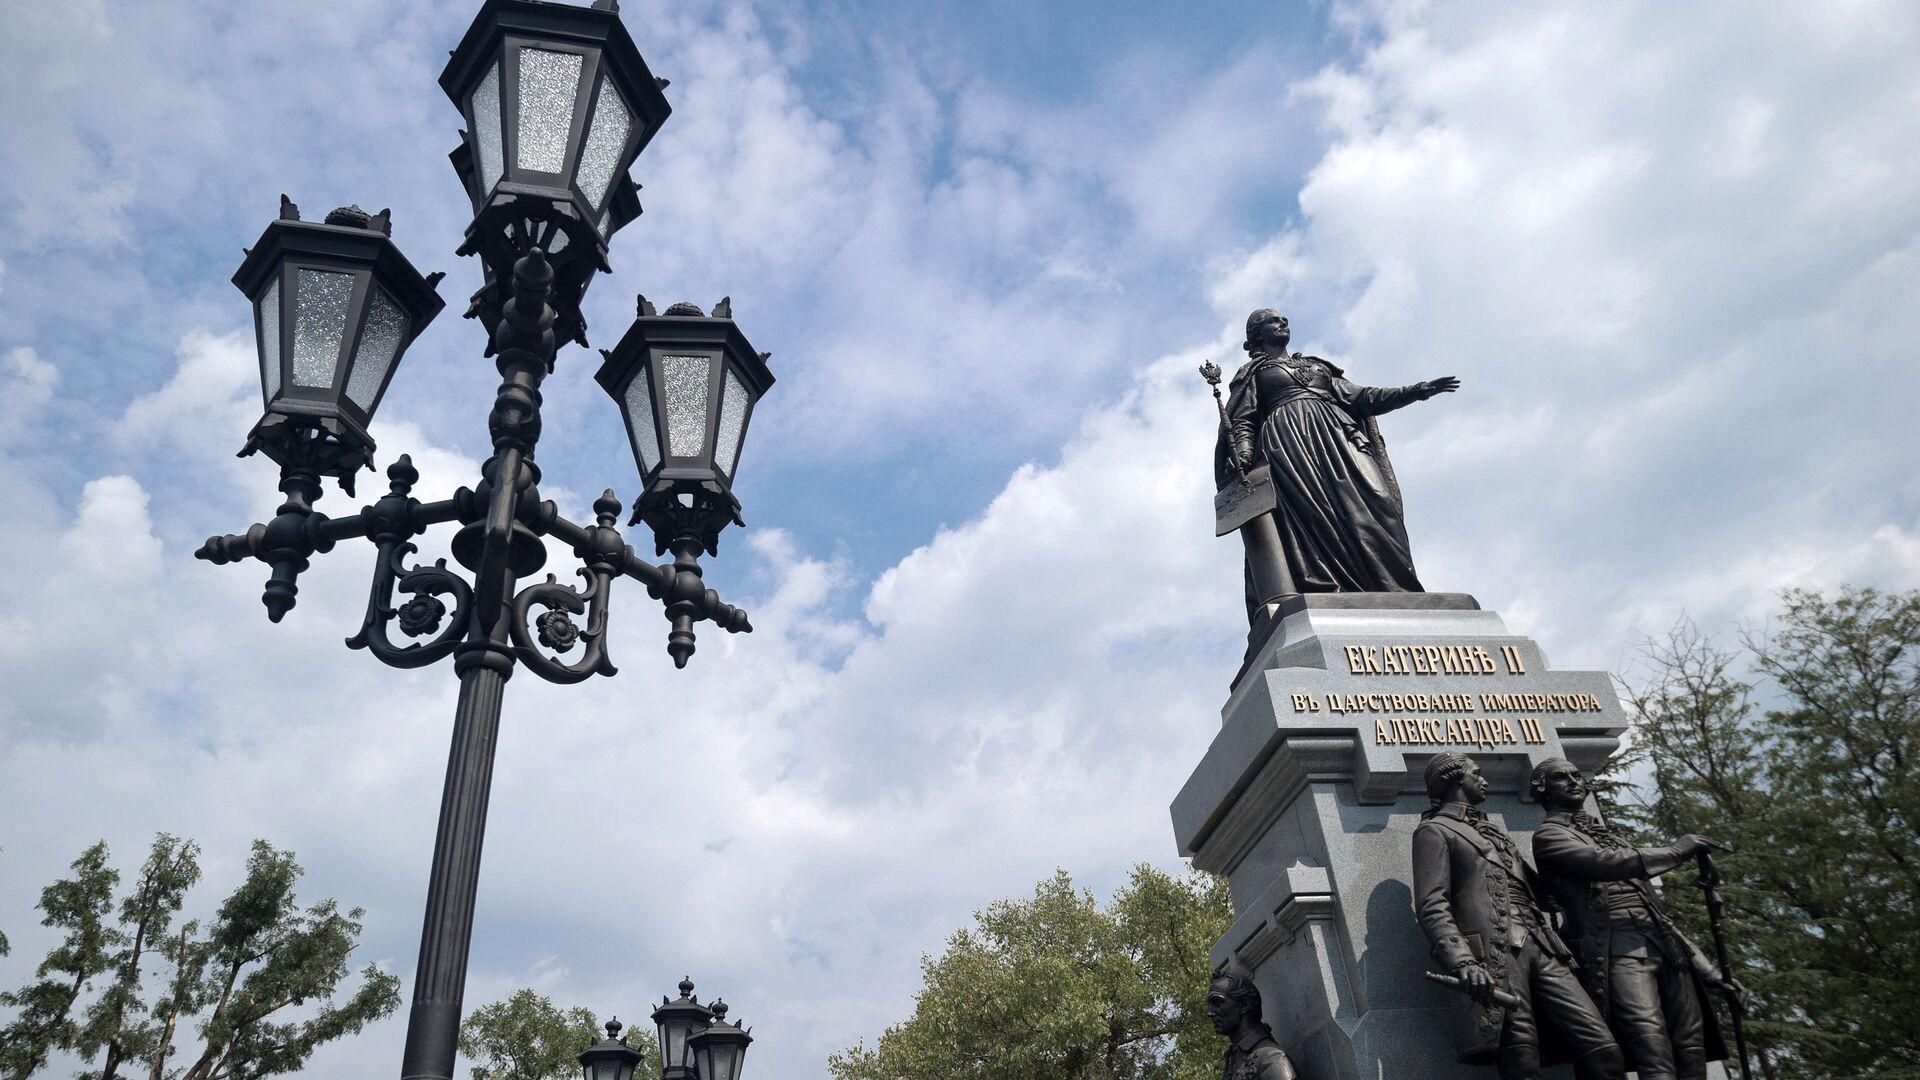 Памятник Екатерине II в Симферополе - РИА Новости, 1920, 08.03.2021